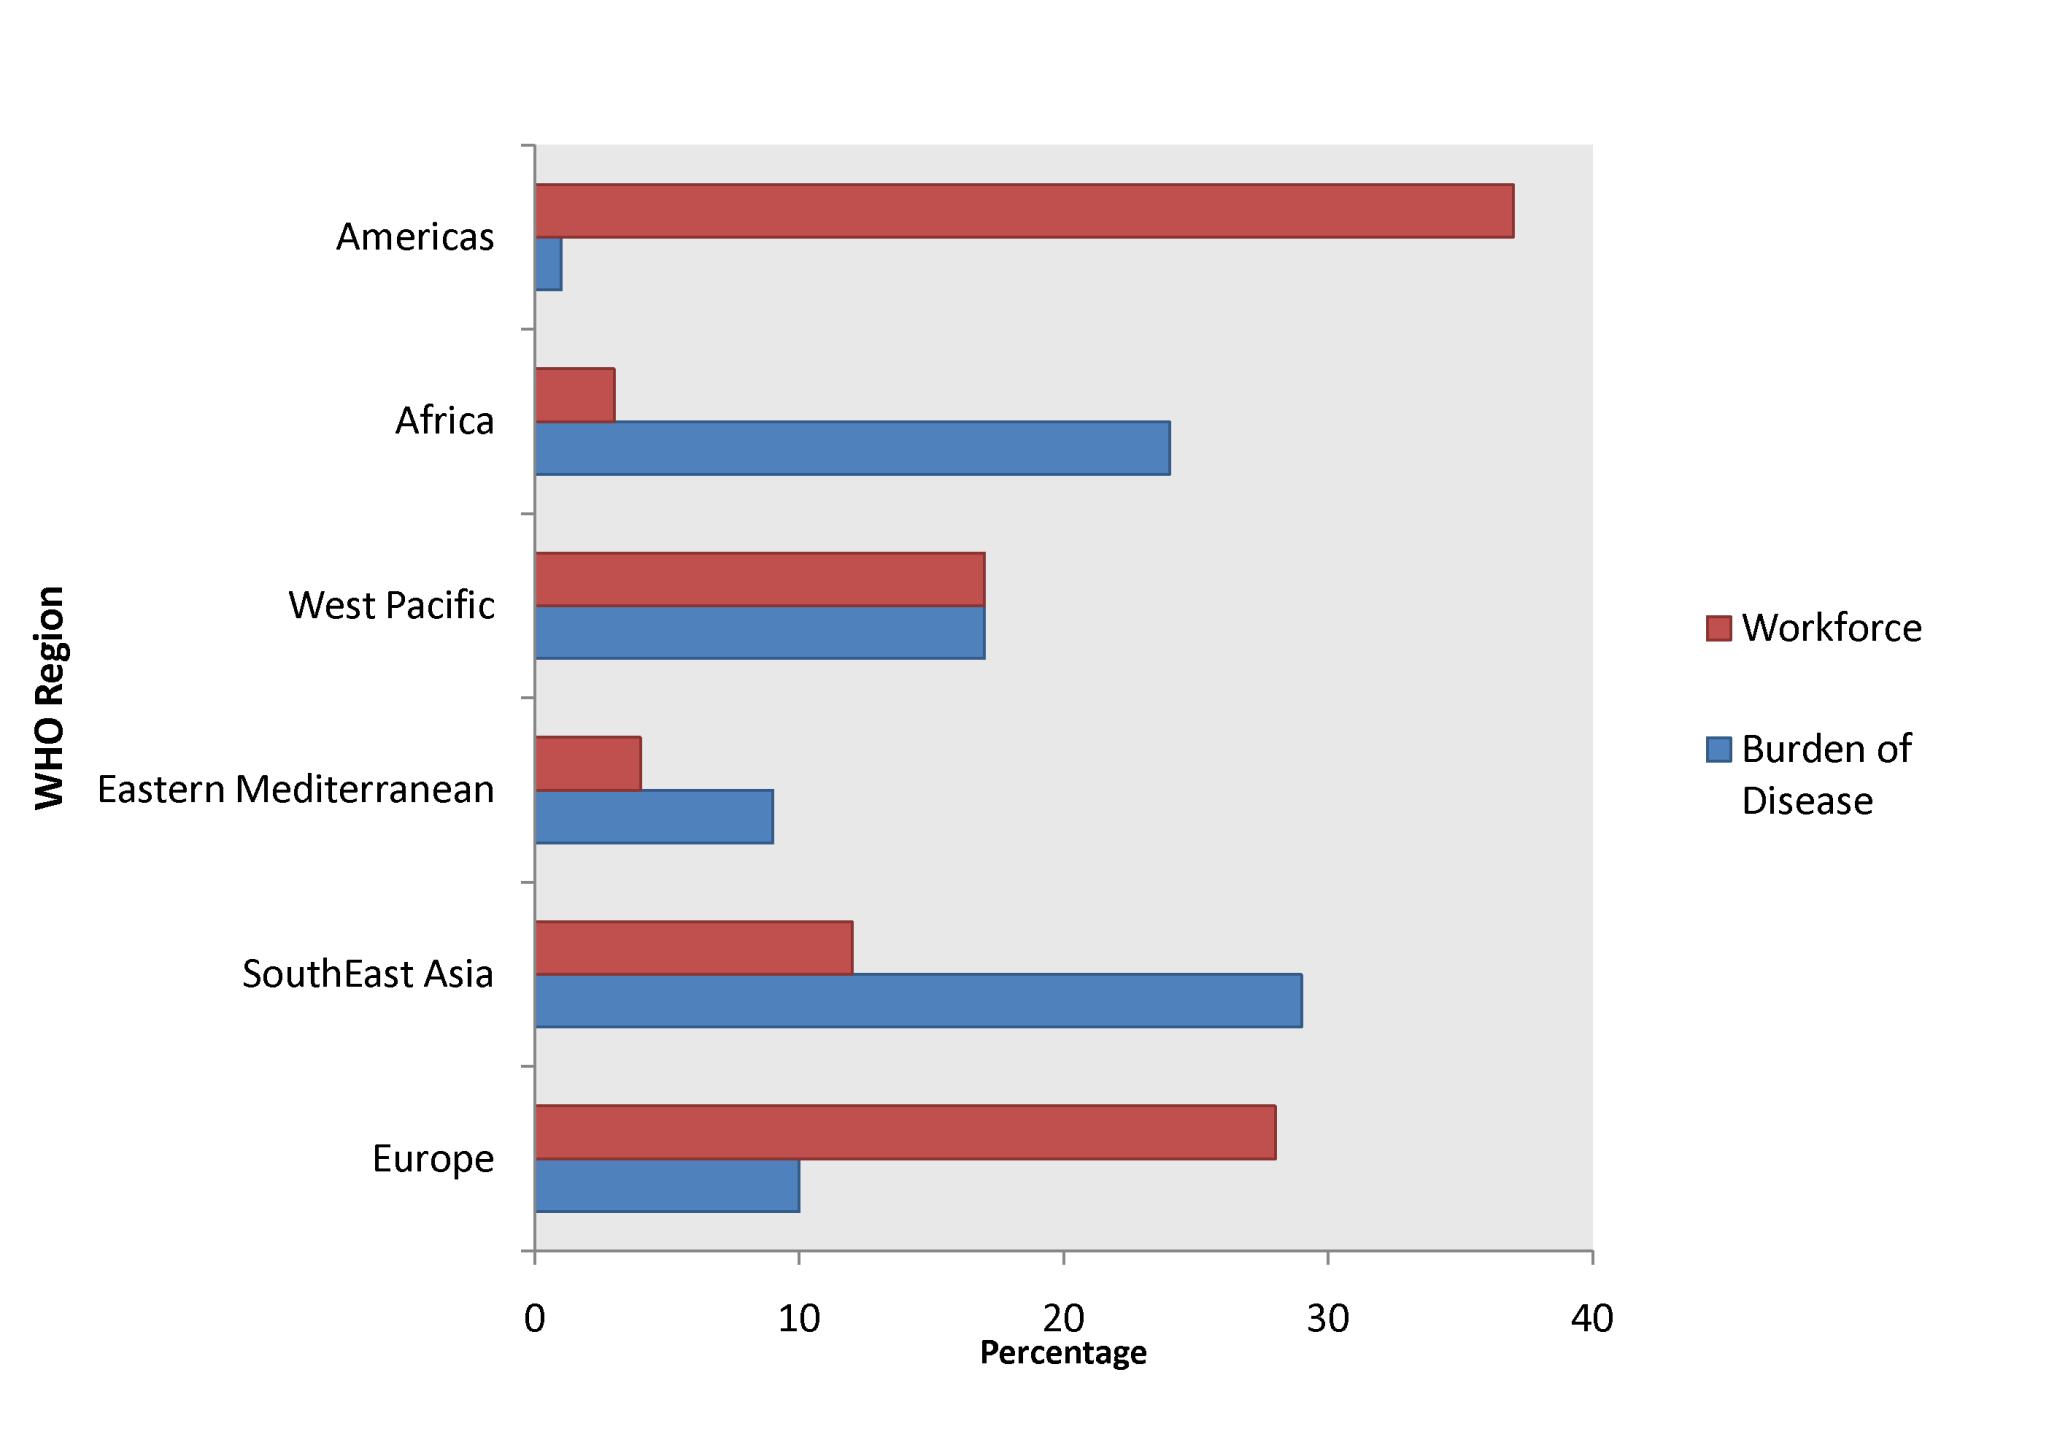 "Global burden of disease versus workforce <em class=""ref"">[33]</em>,<em class=""ref"">[34]</em>."